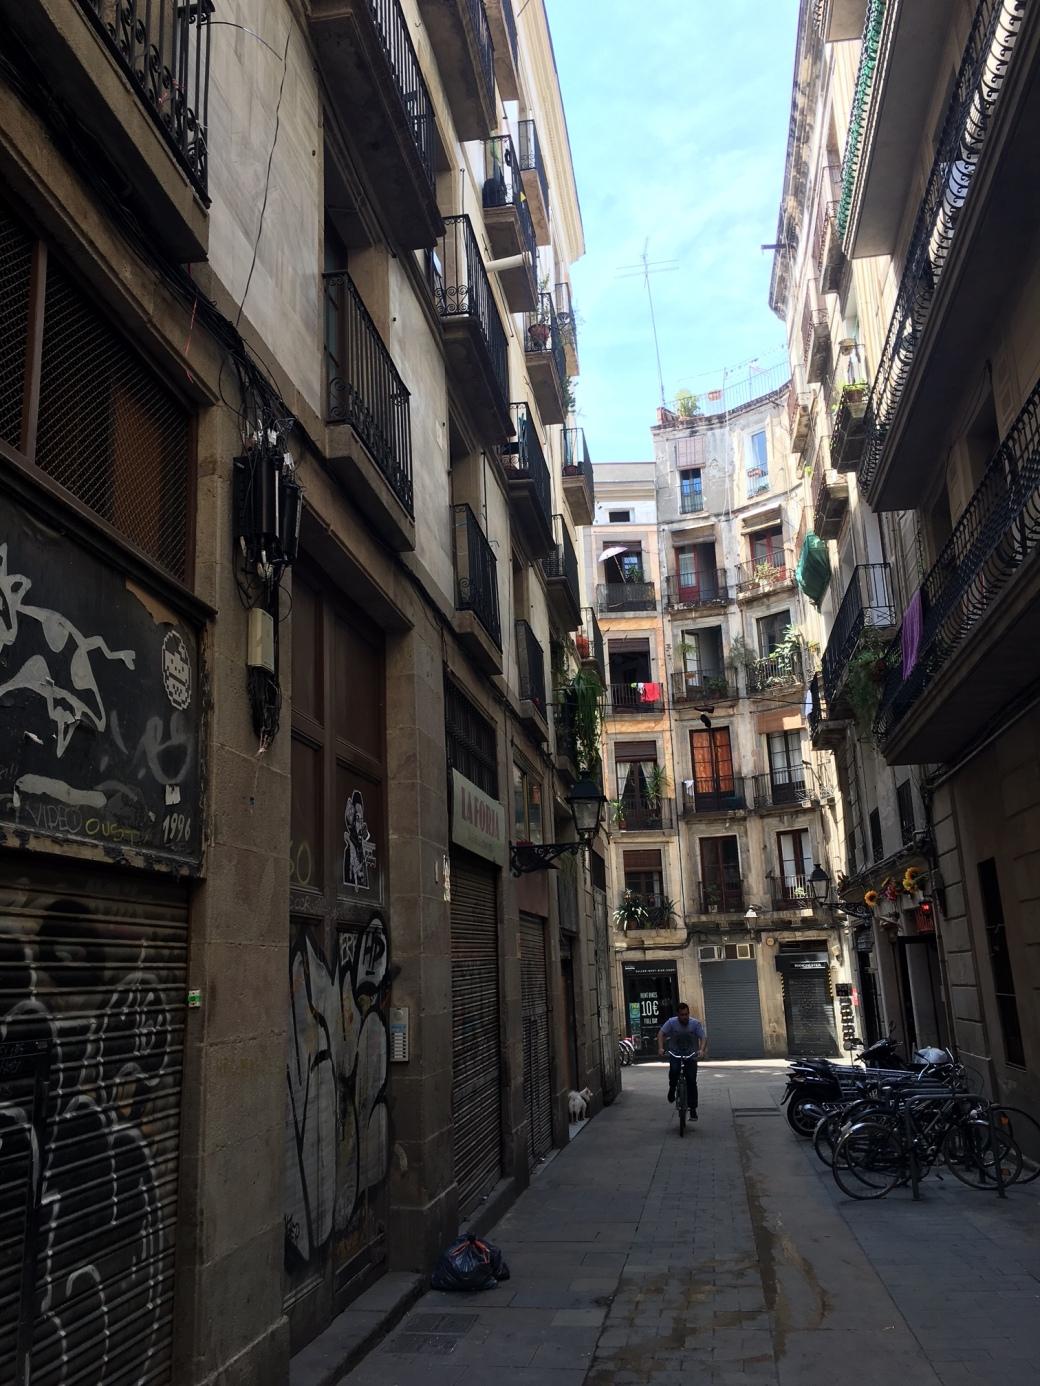 Barca_MilansSt